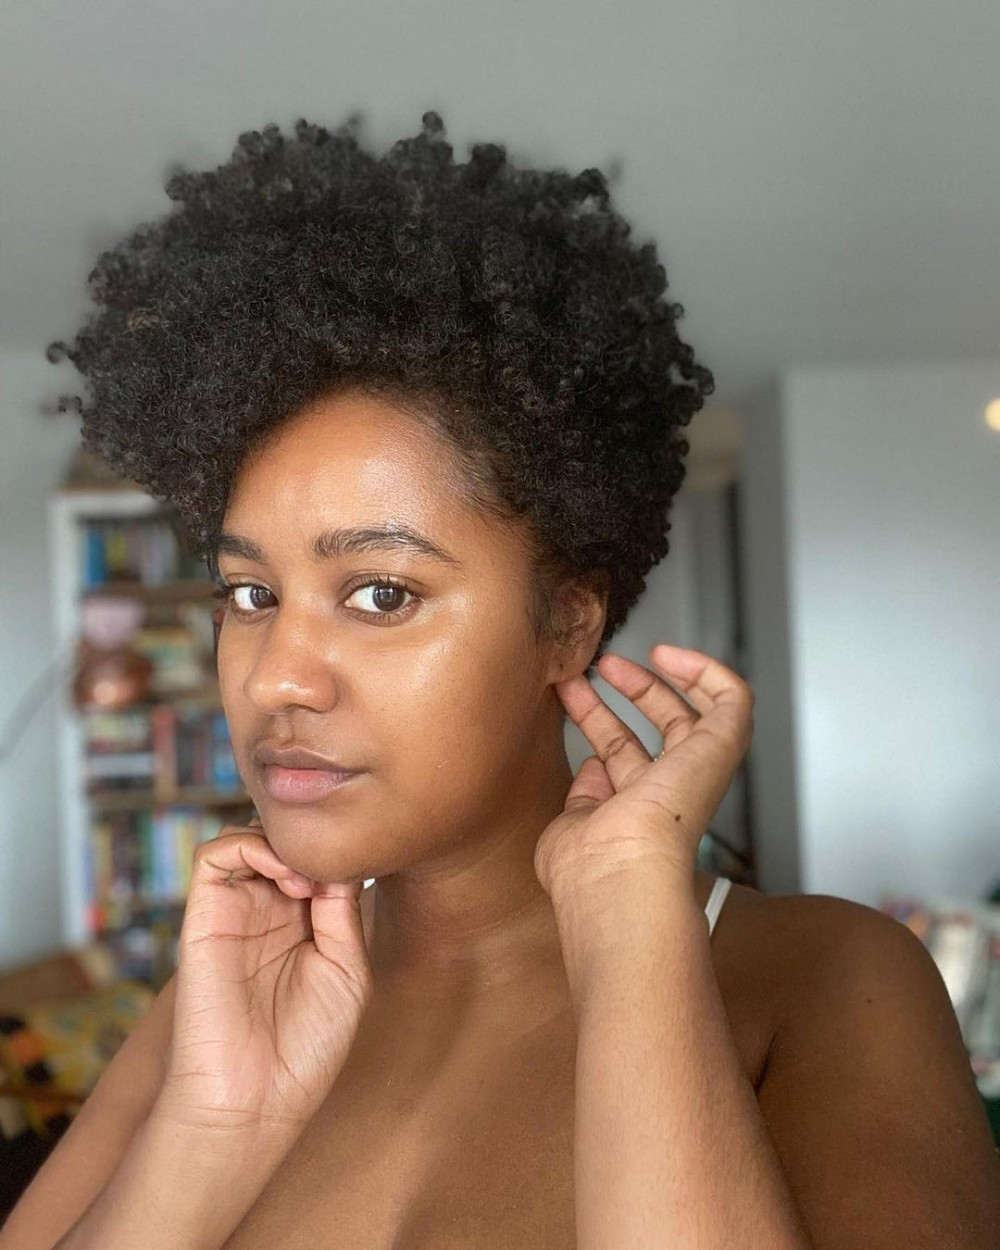 Hair Rules (@hairrules) • Instagram photos and videos